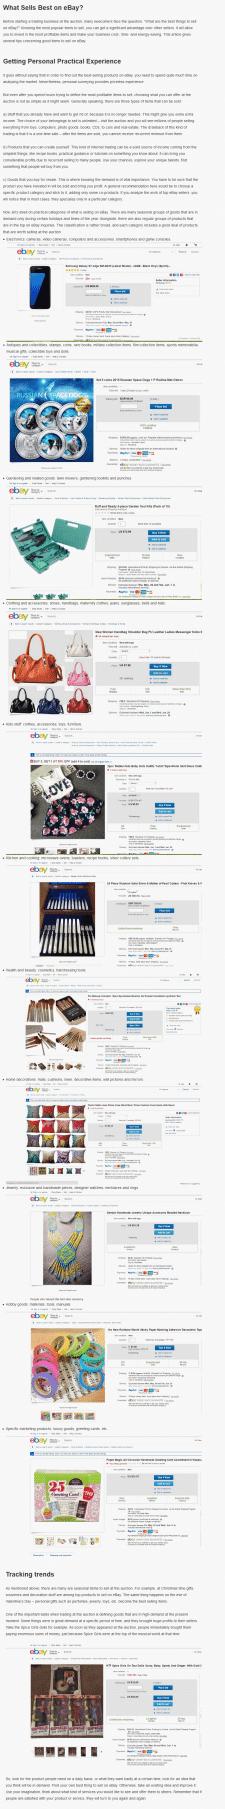 EN | ТОРГОВЛЯ, Сервис покупки на eBay и Amazon